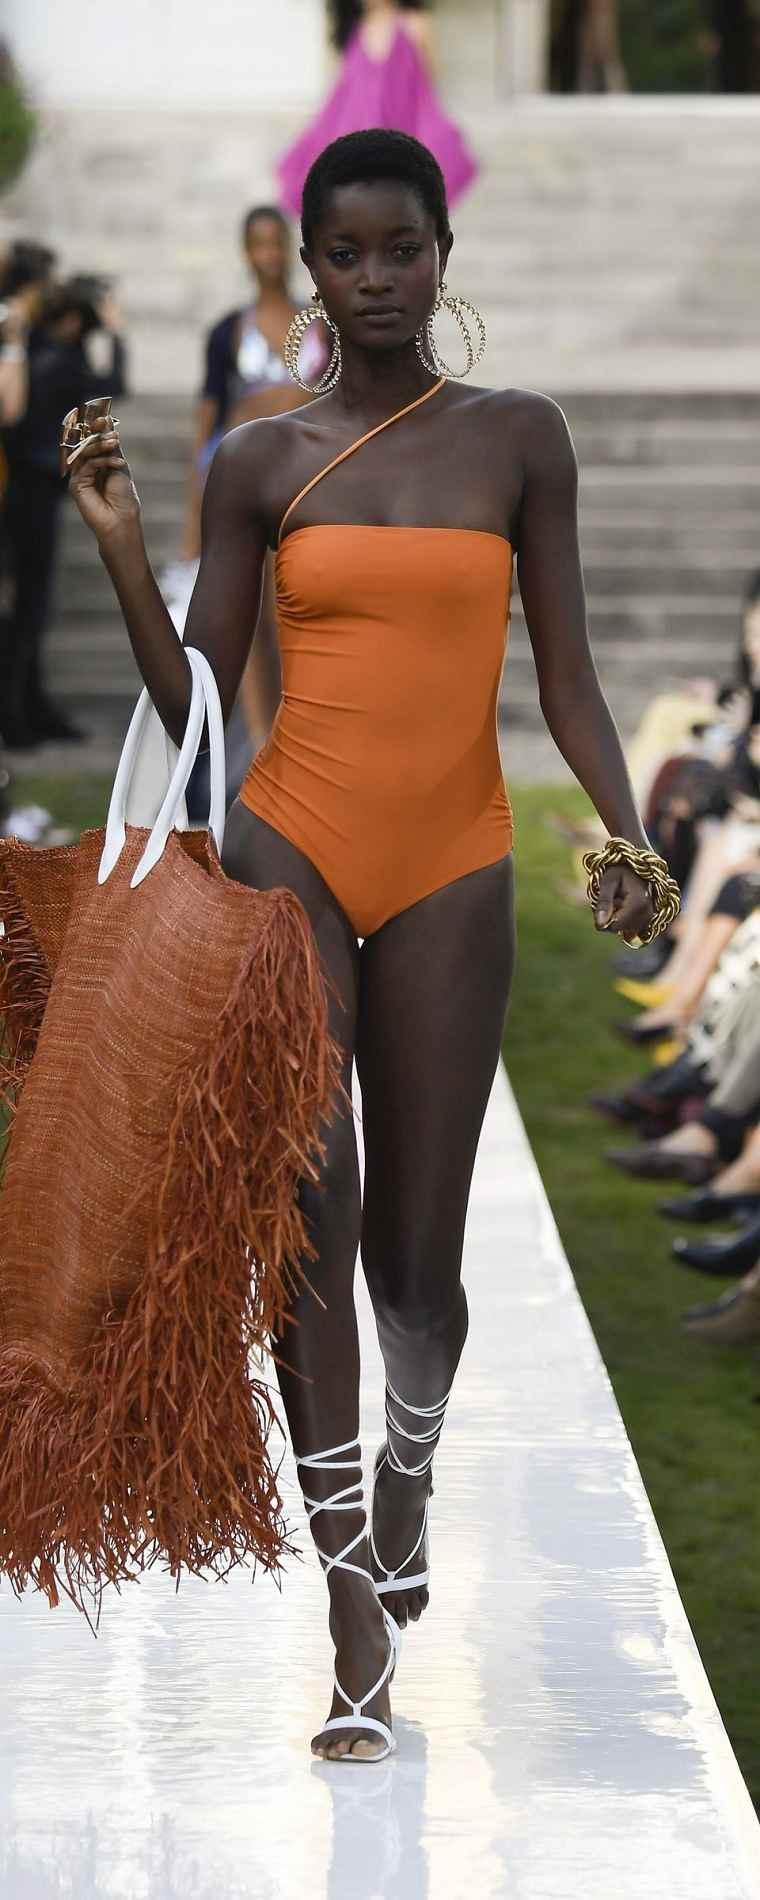 Trajes-de-bano-mujer-color-naranja